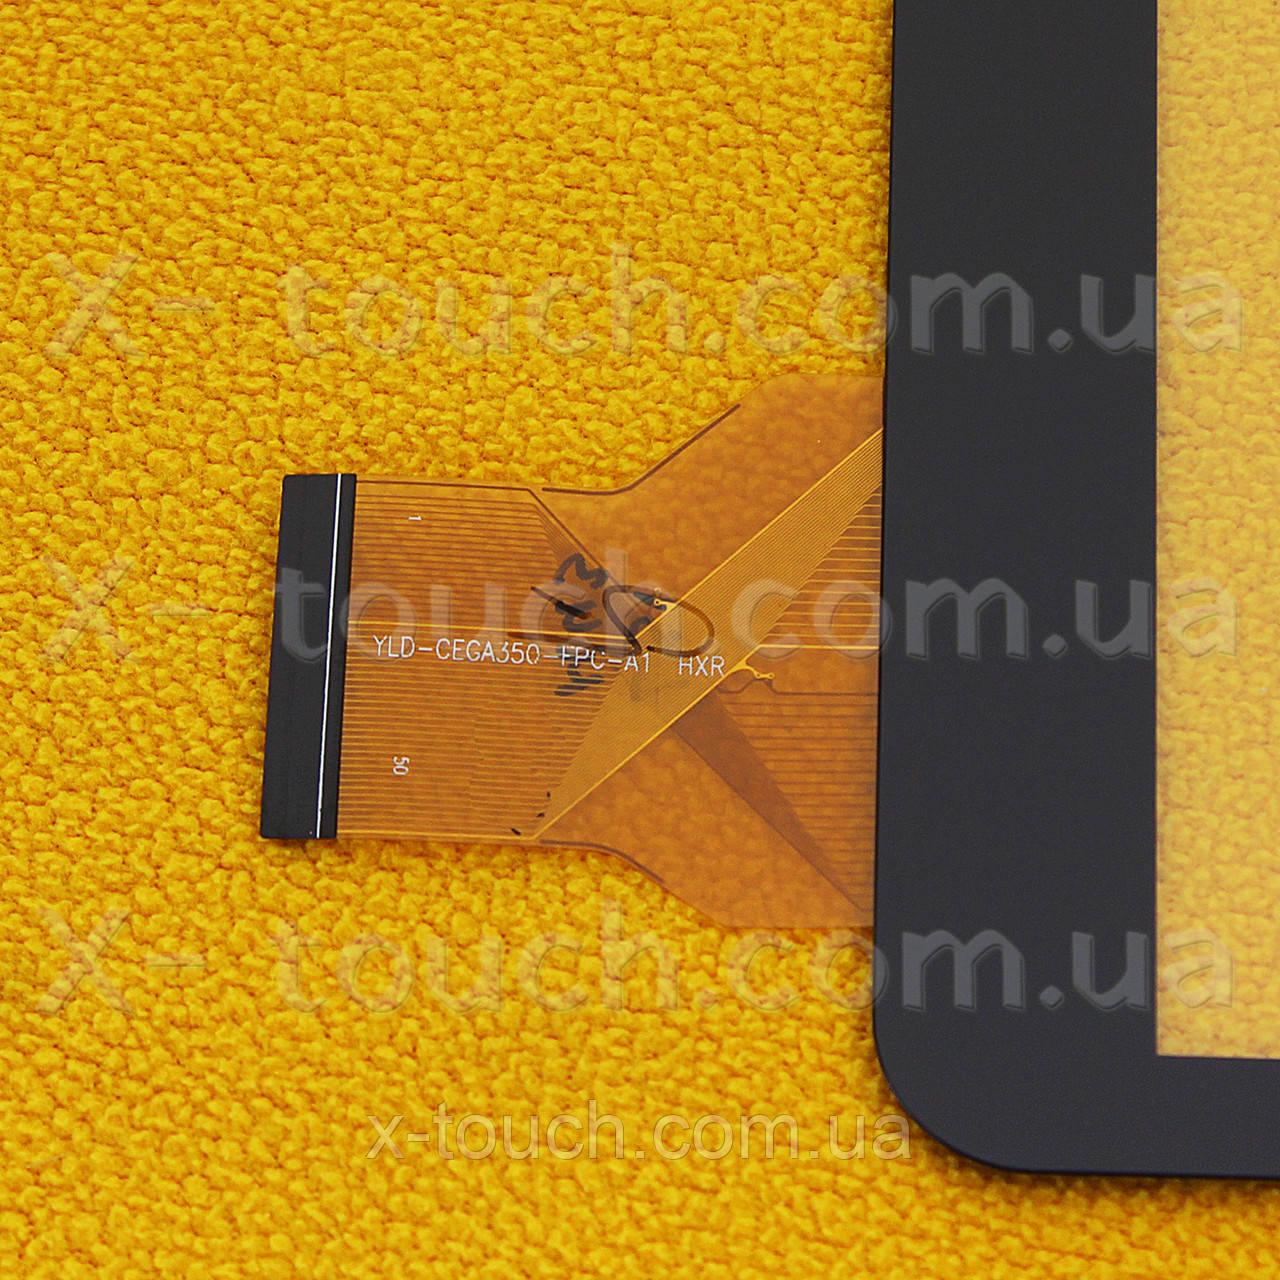 Тачскрин, сенсор  YLD-CEGA350-FPC-A1 HXR для планшета